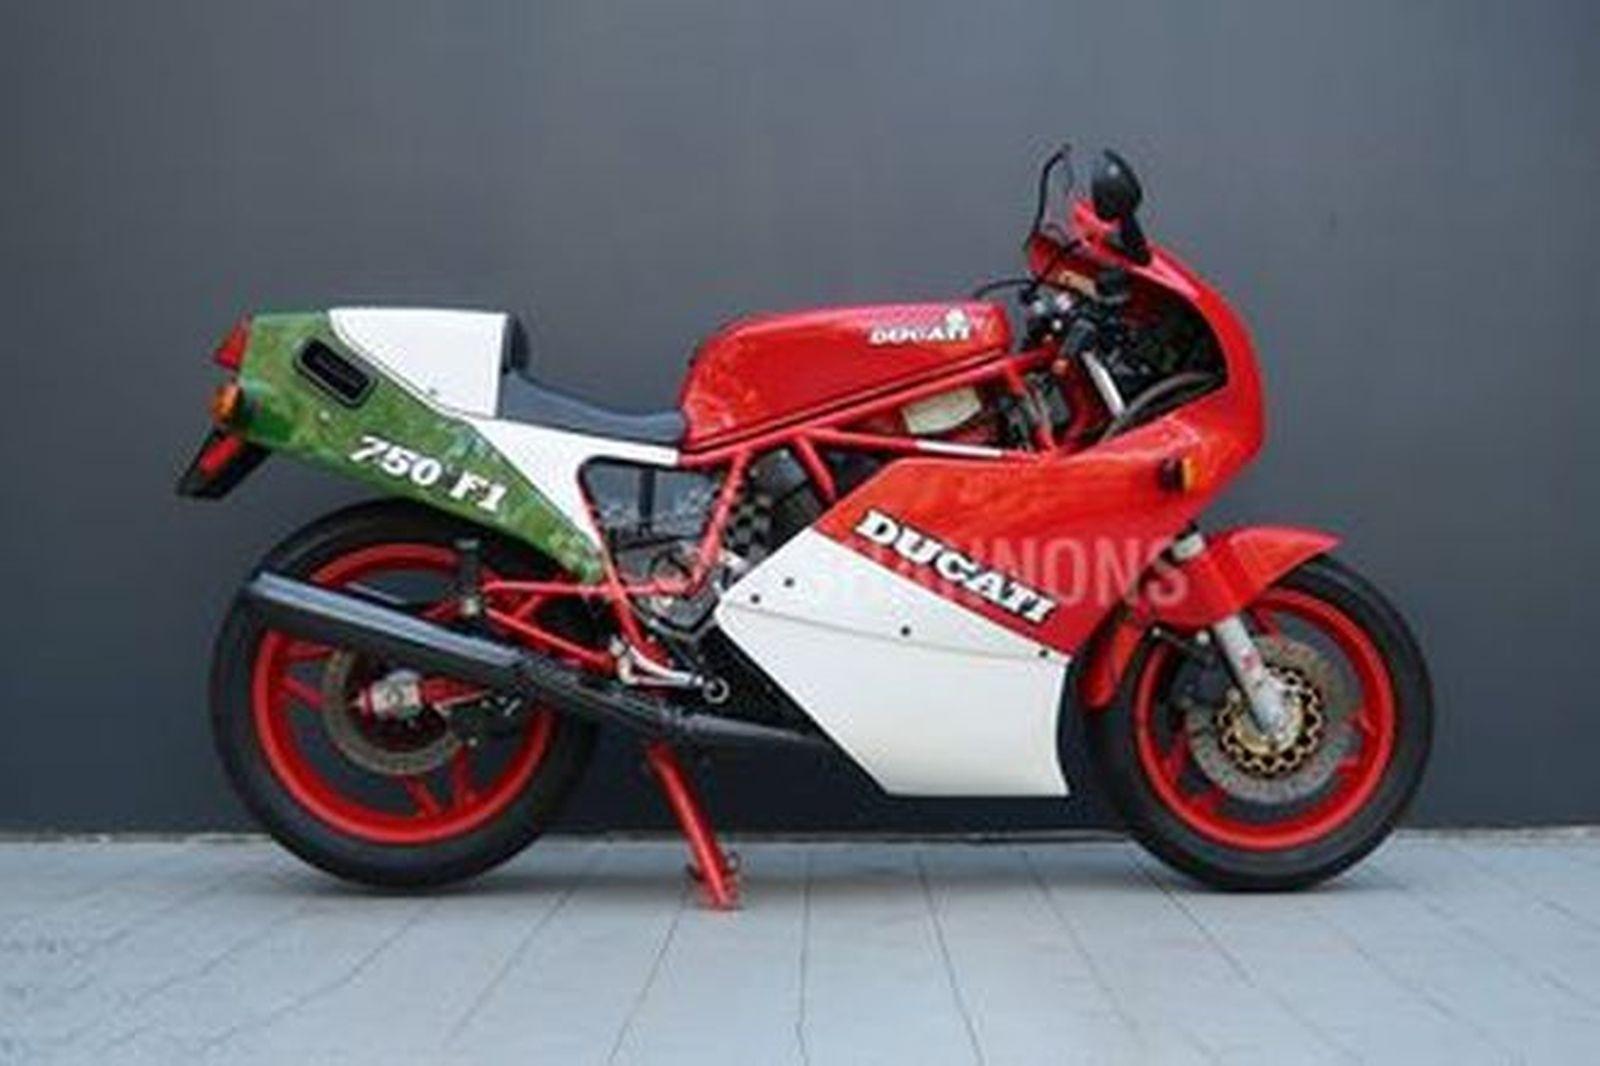 Ducati 750F1 Motorcycle